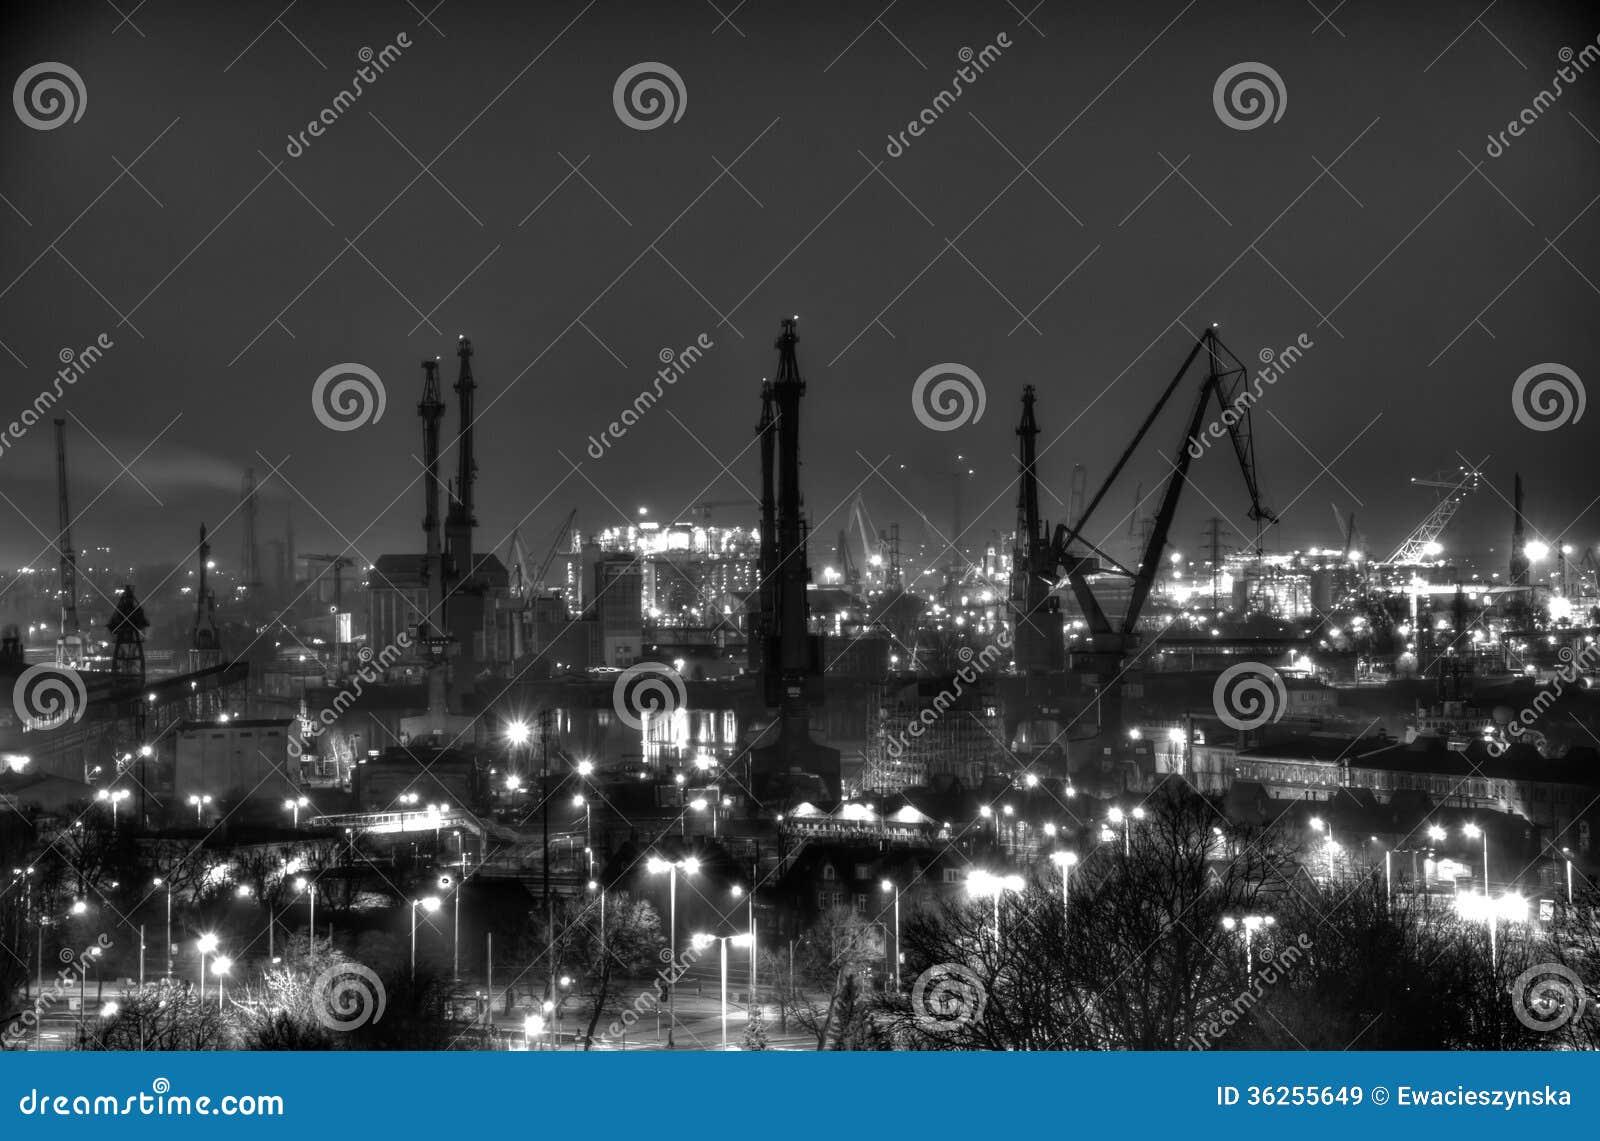 Panorama of gdansk shipyard photo black white by night